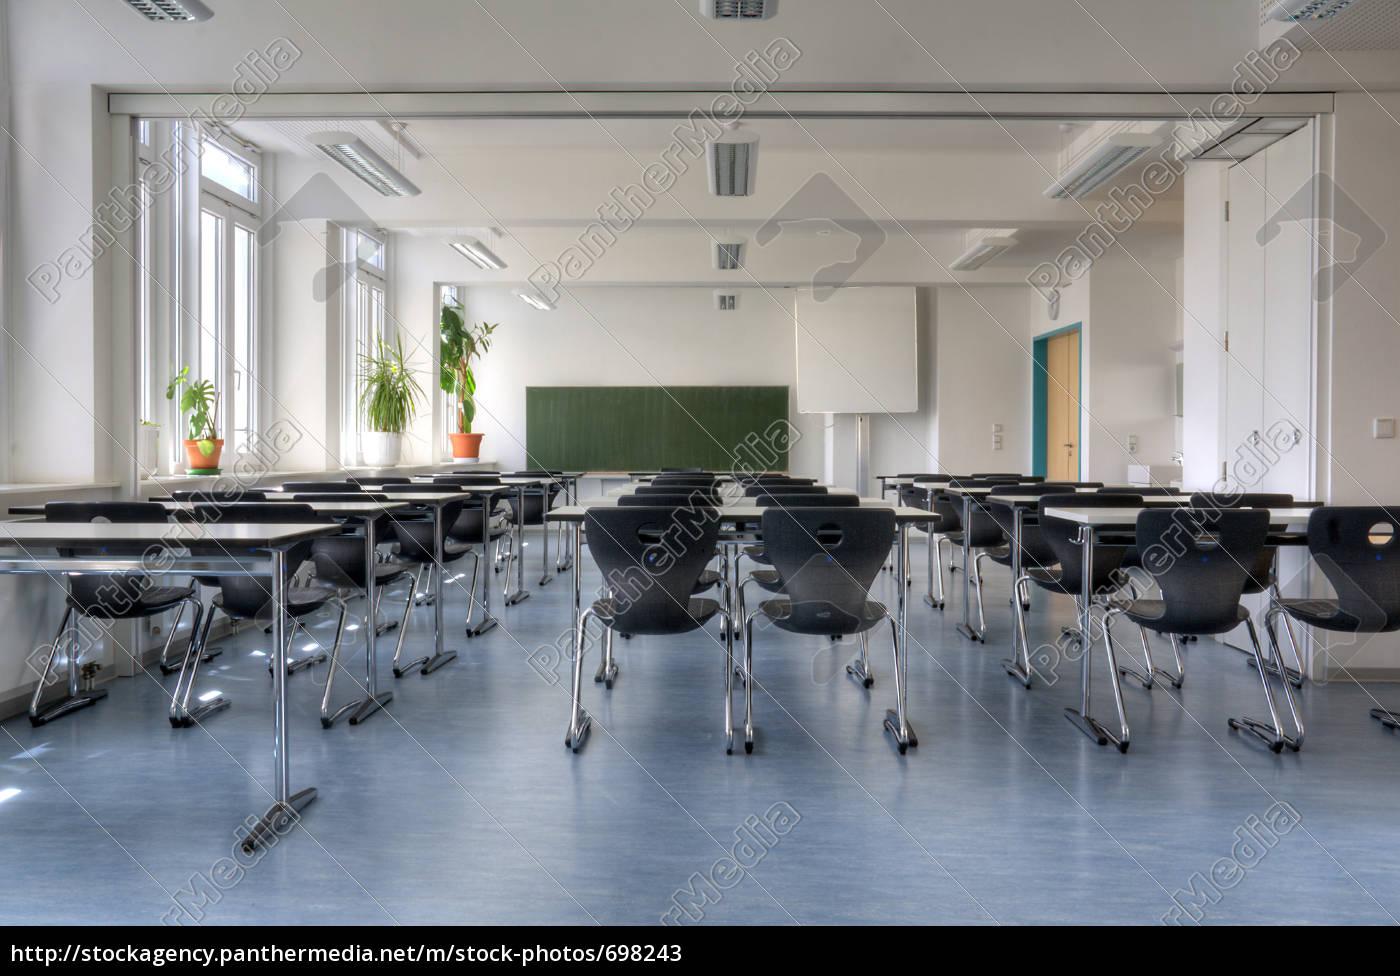 teaching, room - 698243